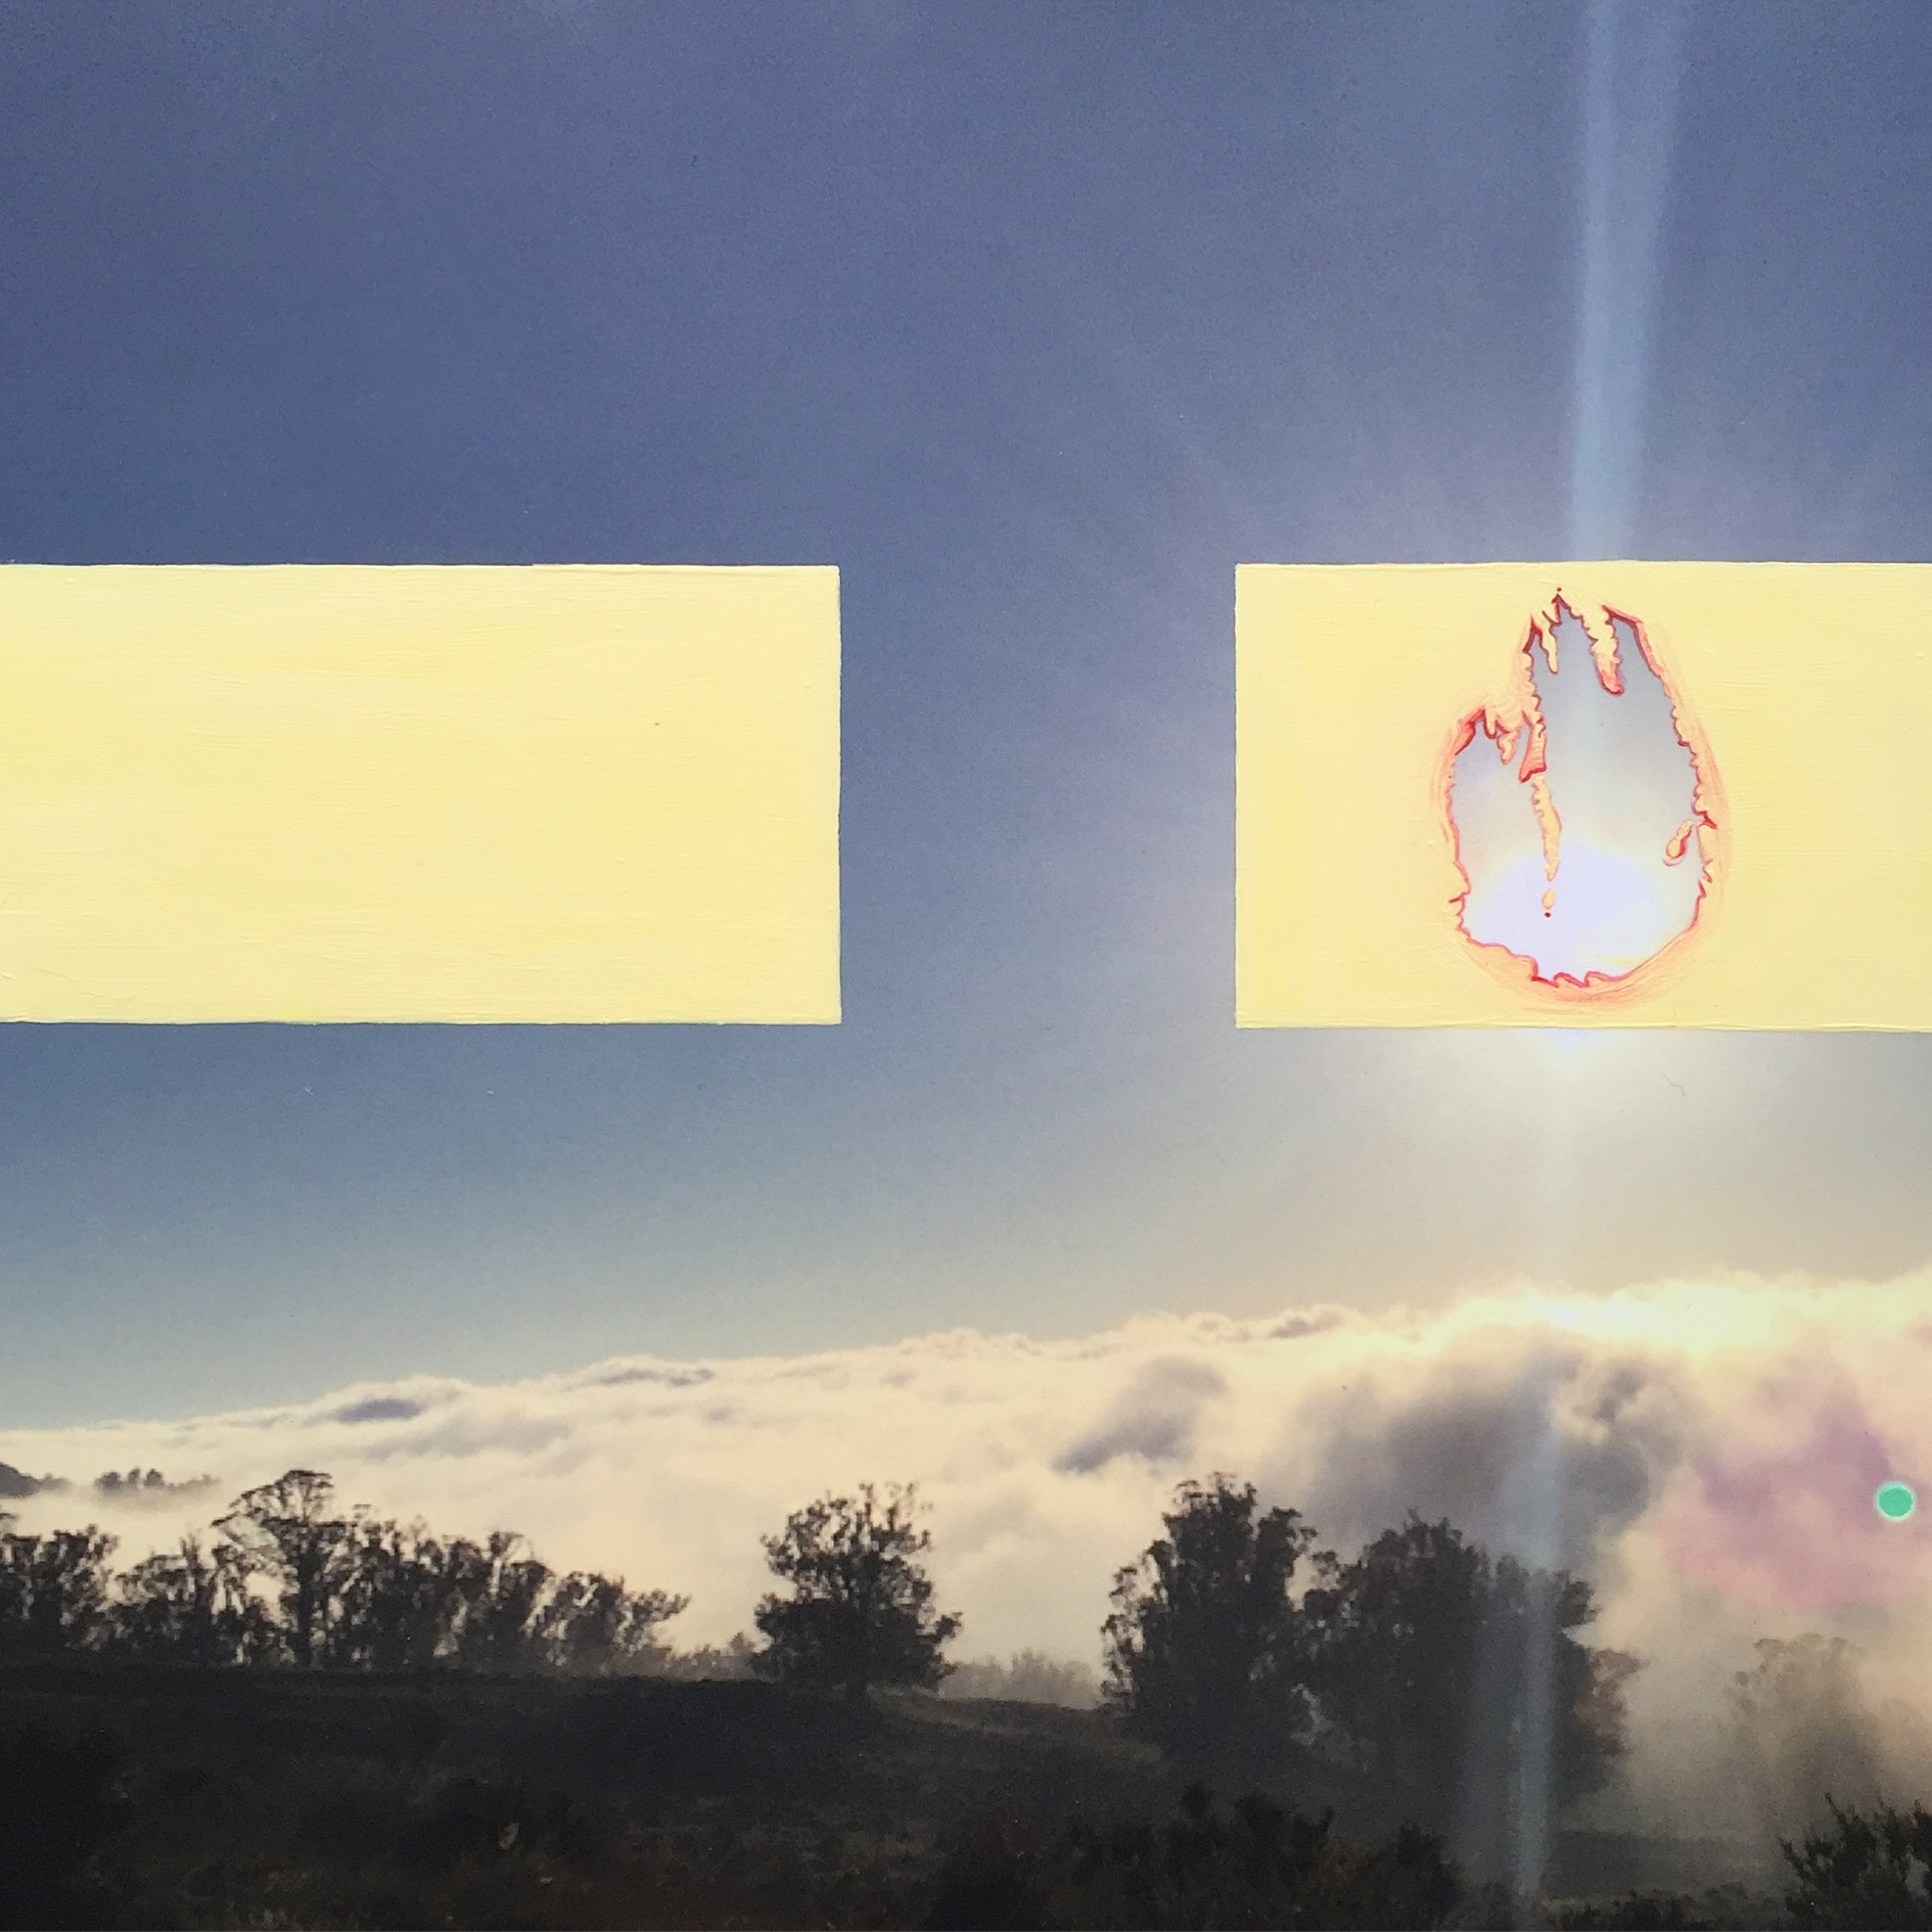 "Lighter days will soon begin - 10 x 10"", mixed media on birch panel, SOLD"